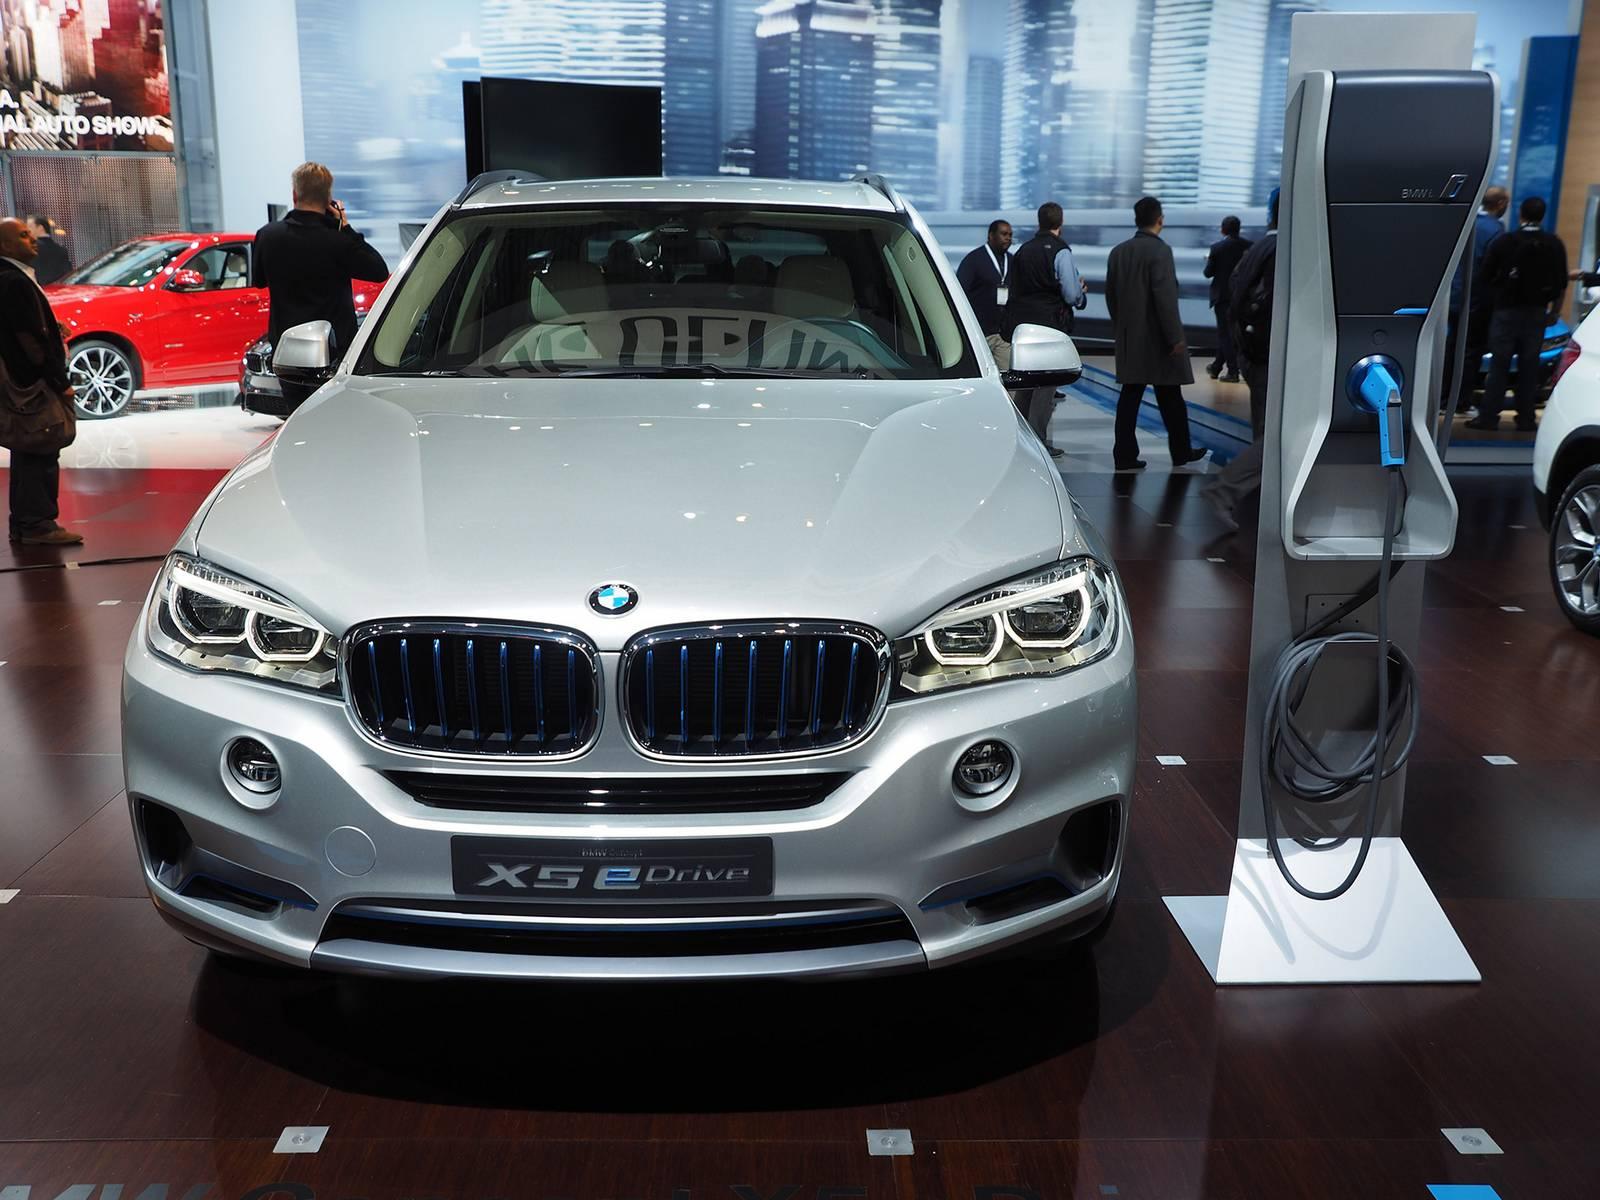 New York 2014: BMW X5 Concept eDrive